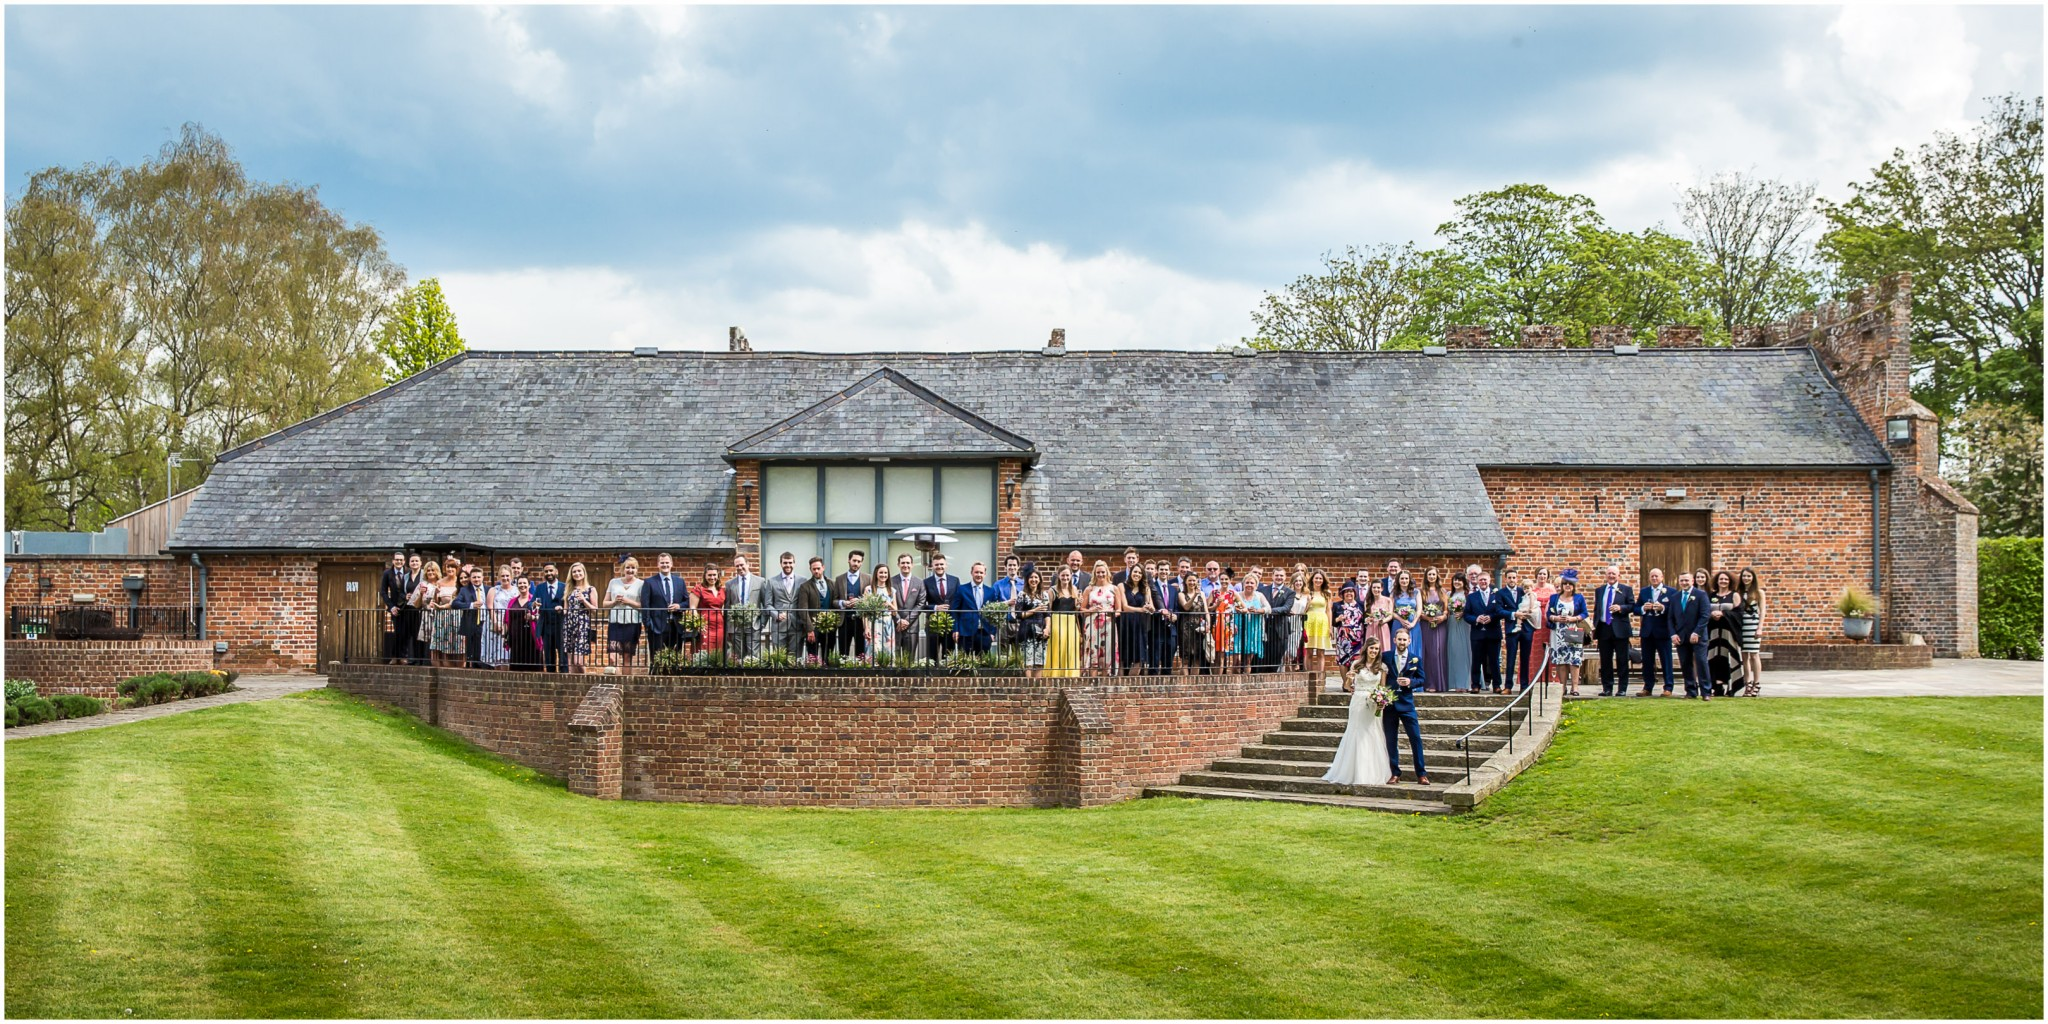 Wasing Park Wedding Photography Group shot